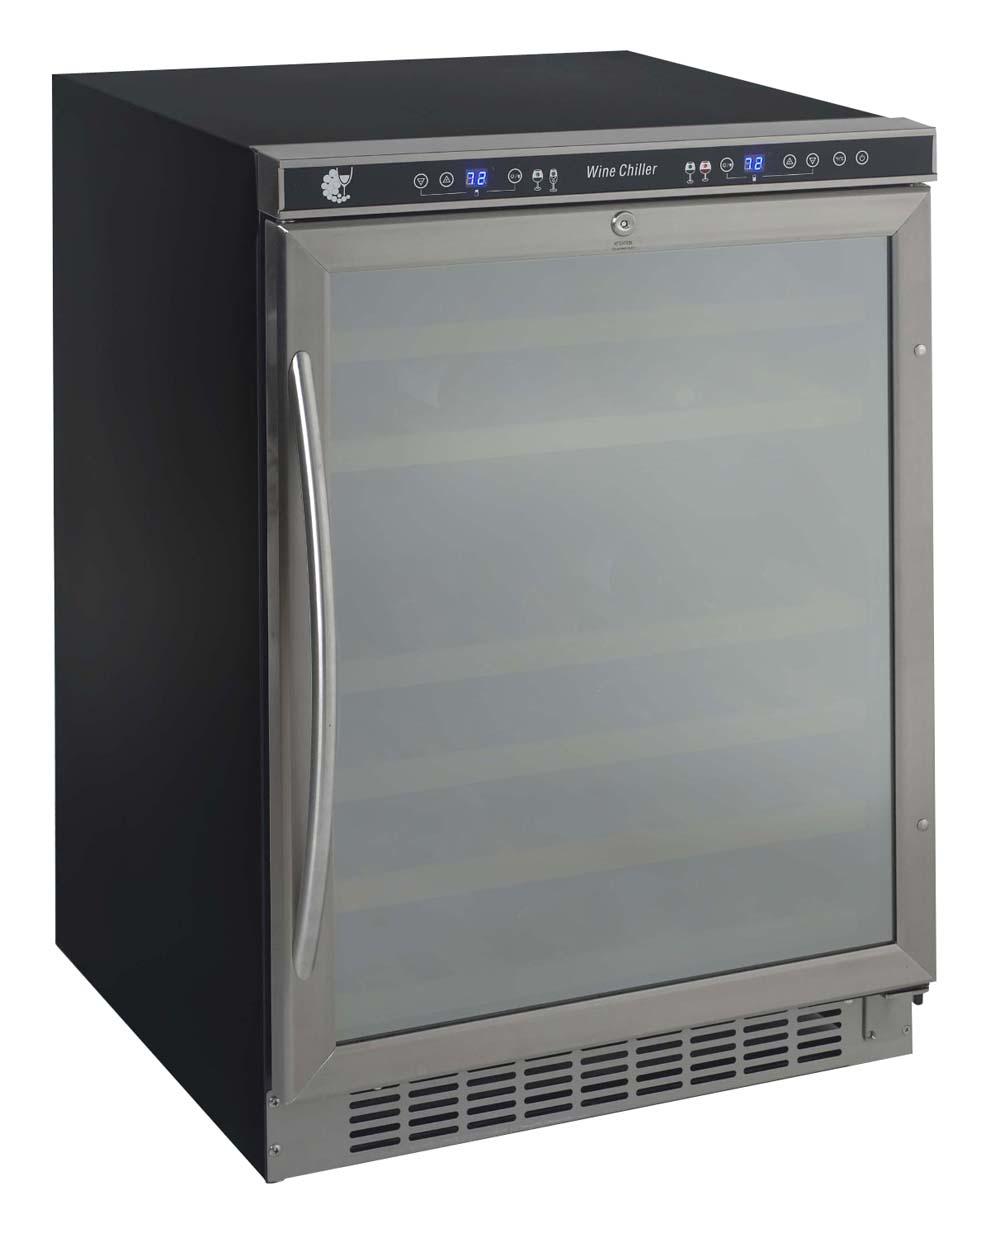 Avanti 7.4 Refrigerator | Avanti 3.3 Cu Ft Refrigerator | Avanti Refrigerator